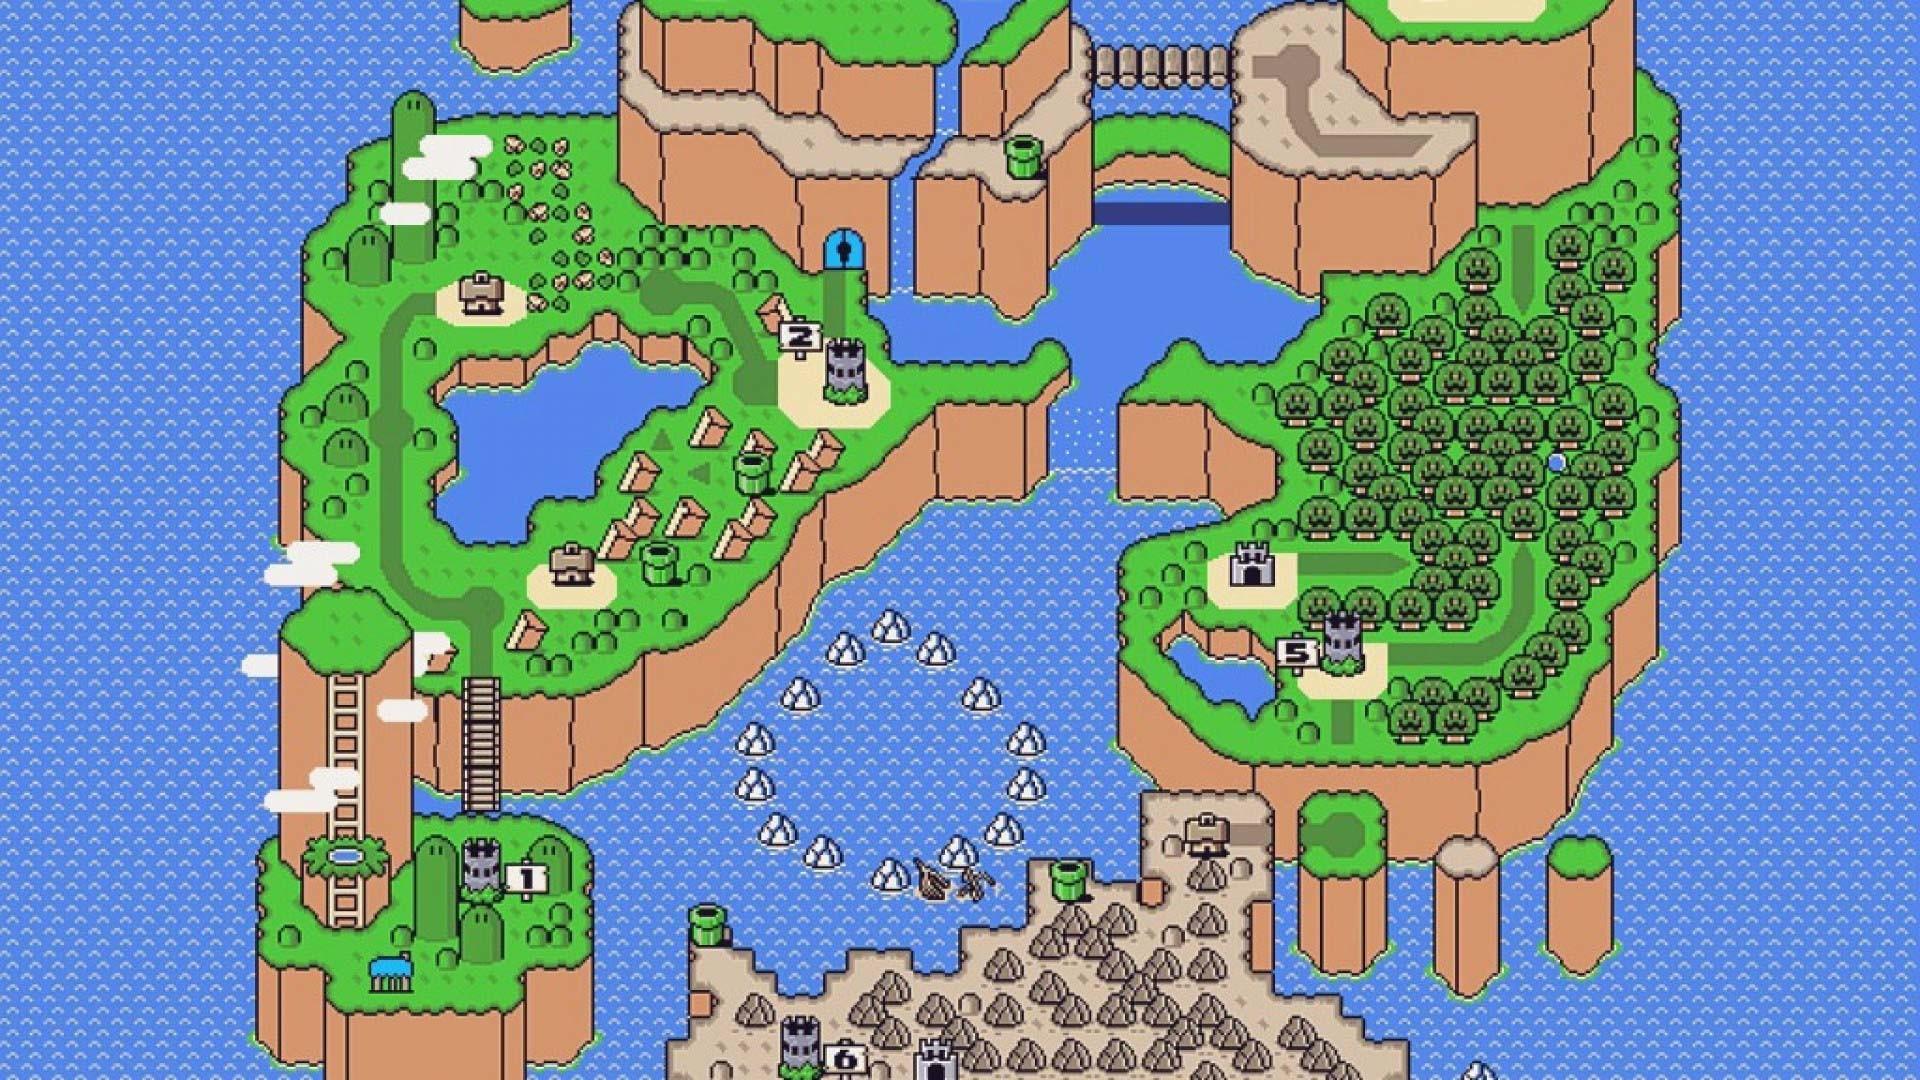 Mario 3 World Map.Super Mario World Map Wallpaper 56 Images